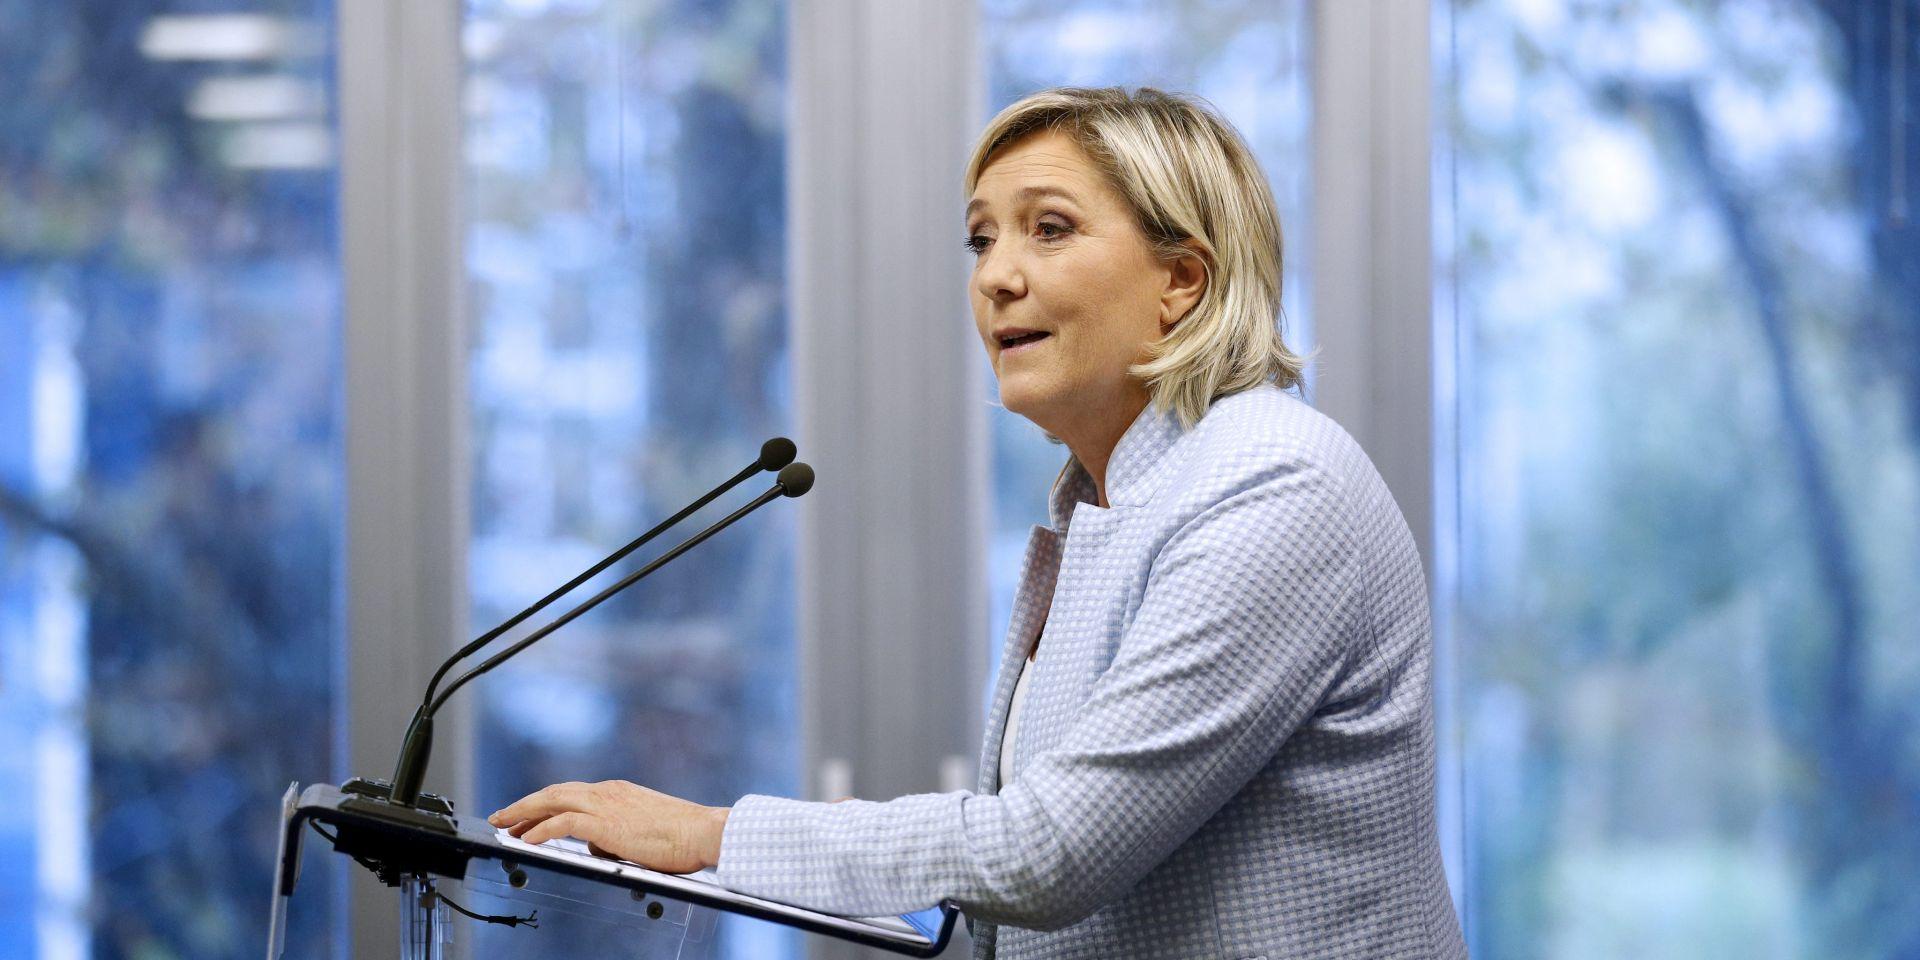 Marine Le Pen mora vratiti 342 tisuće eura Europskom parlamentu